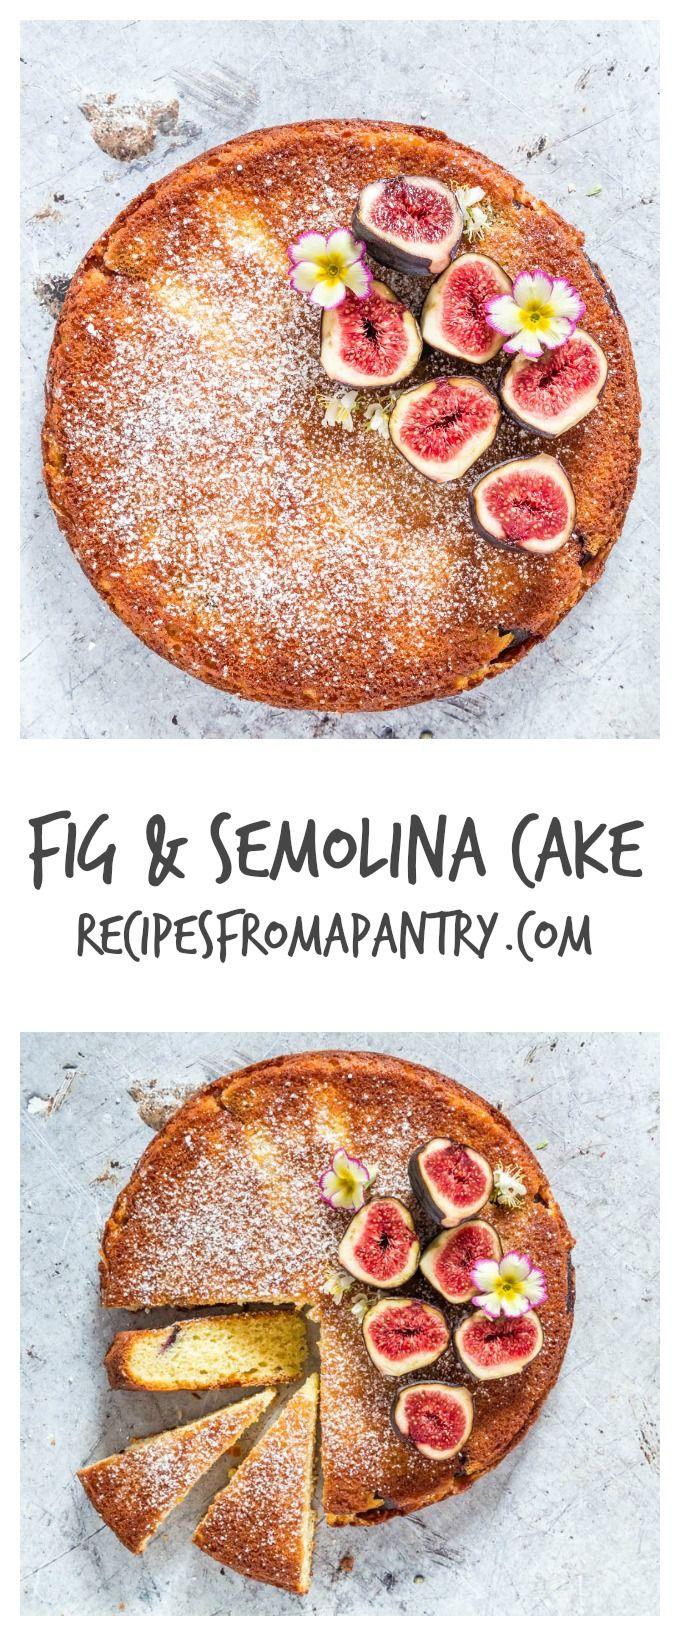 Fig And Semolina Cake - This gorgeous Greek yoghurt, fig and semolina cake recipe has a simple and stunning presentation.   recipesfromapantry.com